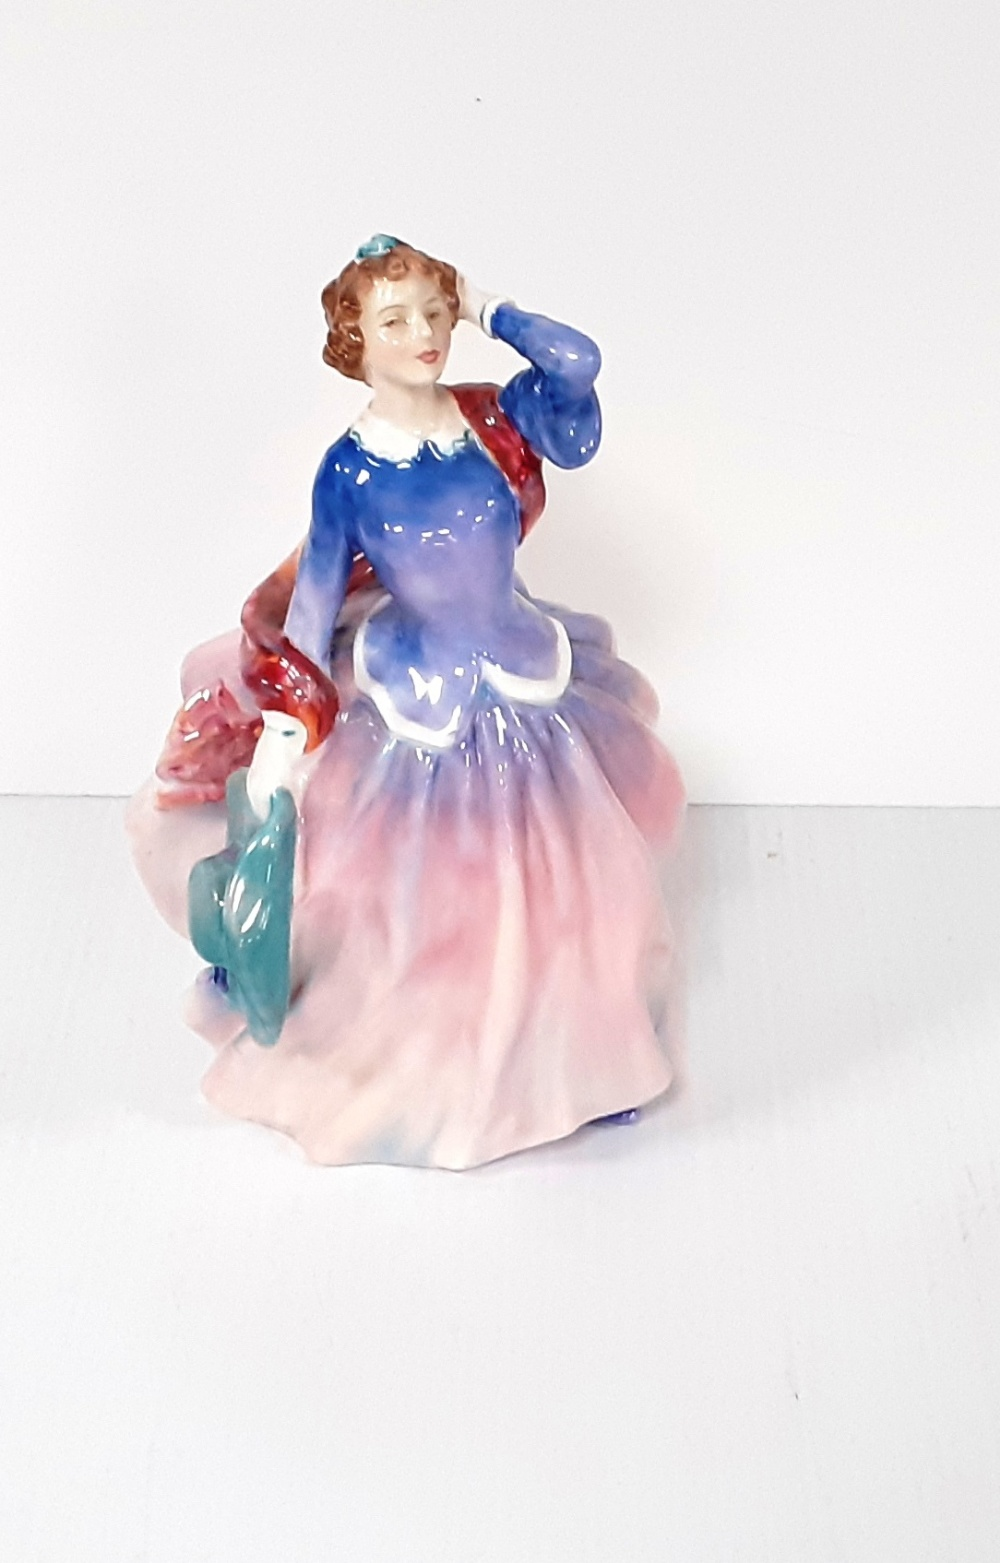 Royal Doulton Figure of a Girl